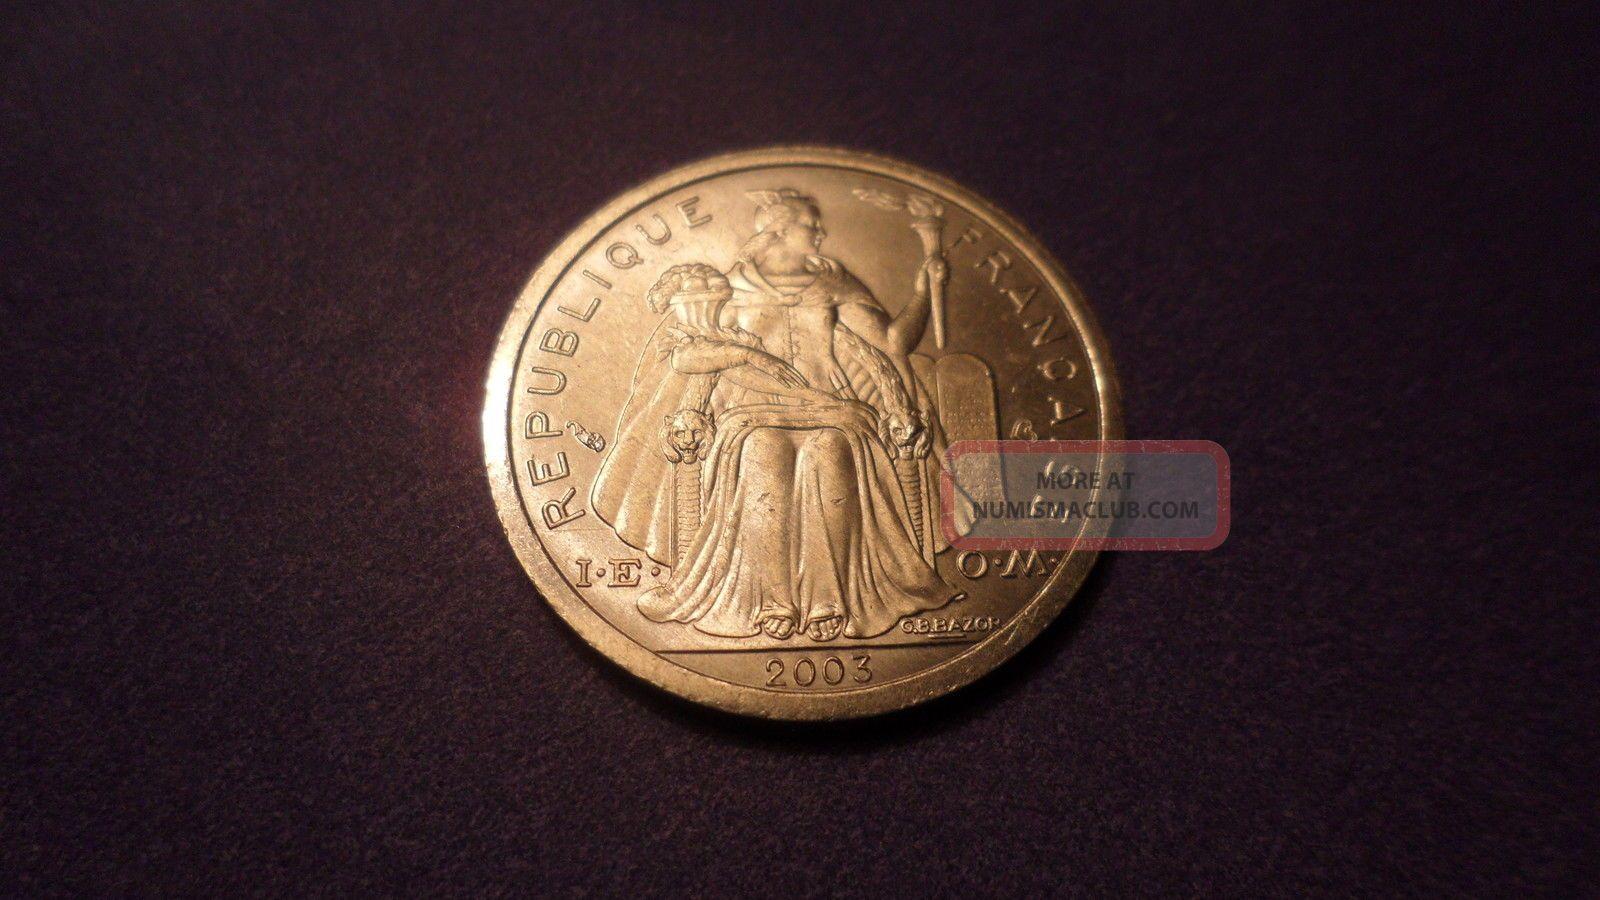 French Polynesia 2003,  One Franc.  B U Tiful Coin. Coins: World photo